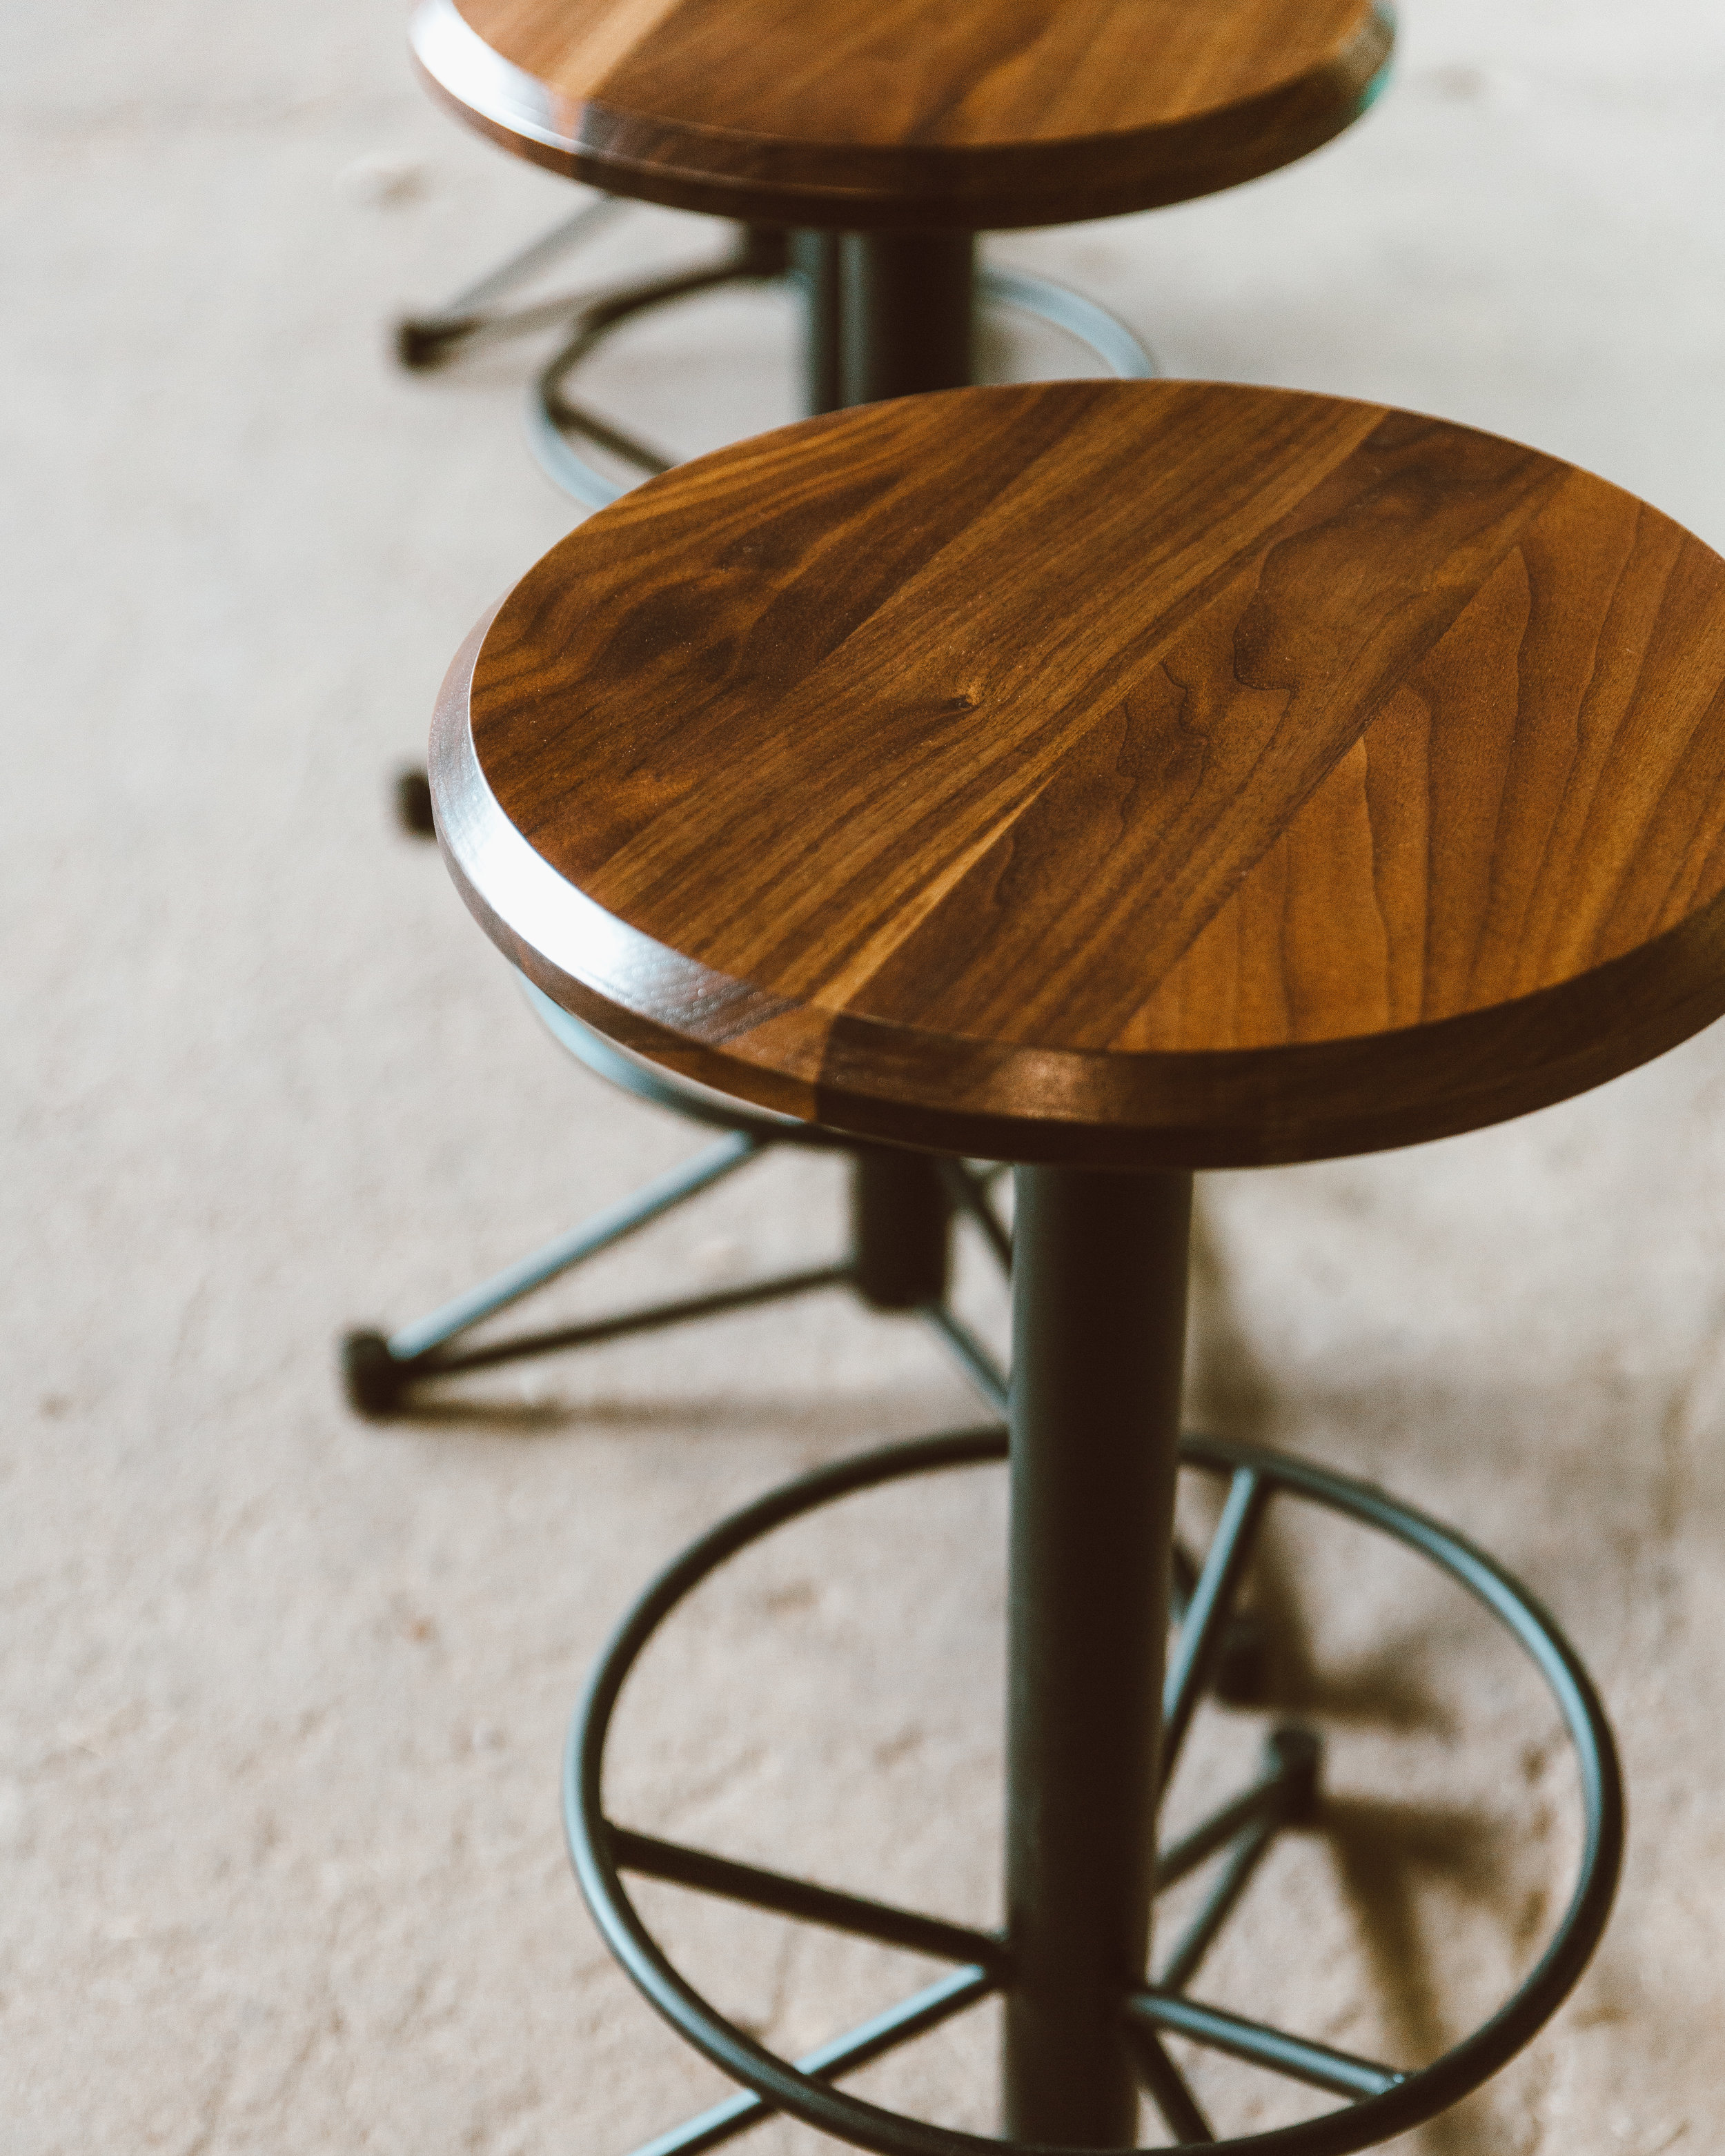 forthehome-edgework-creative-stools07.jpg